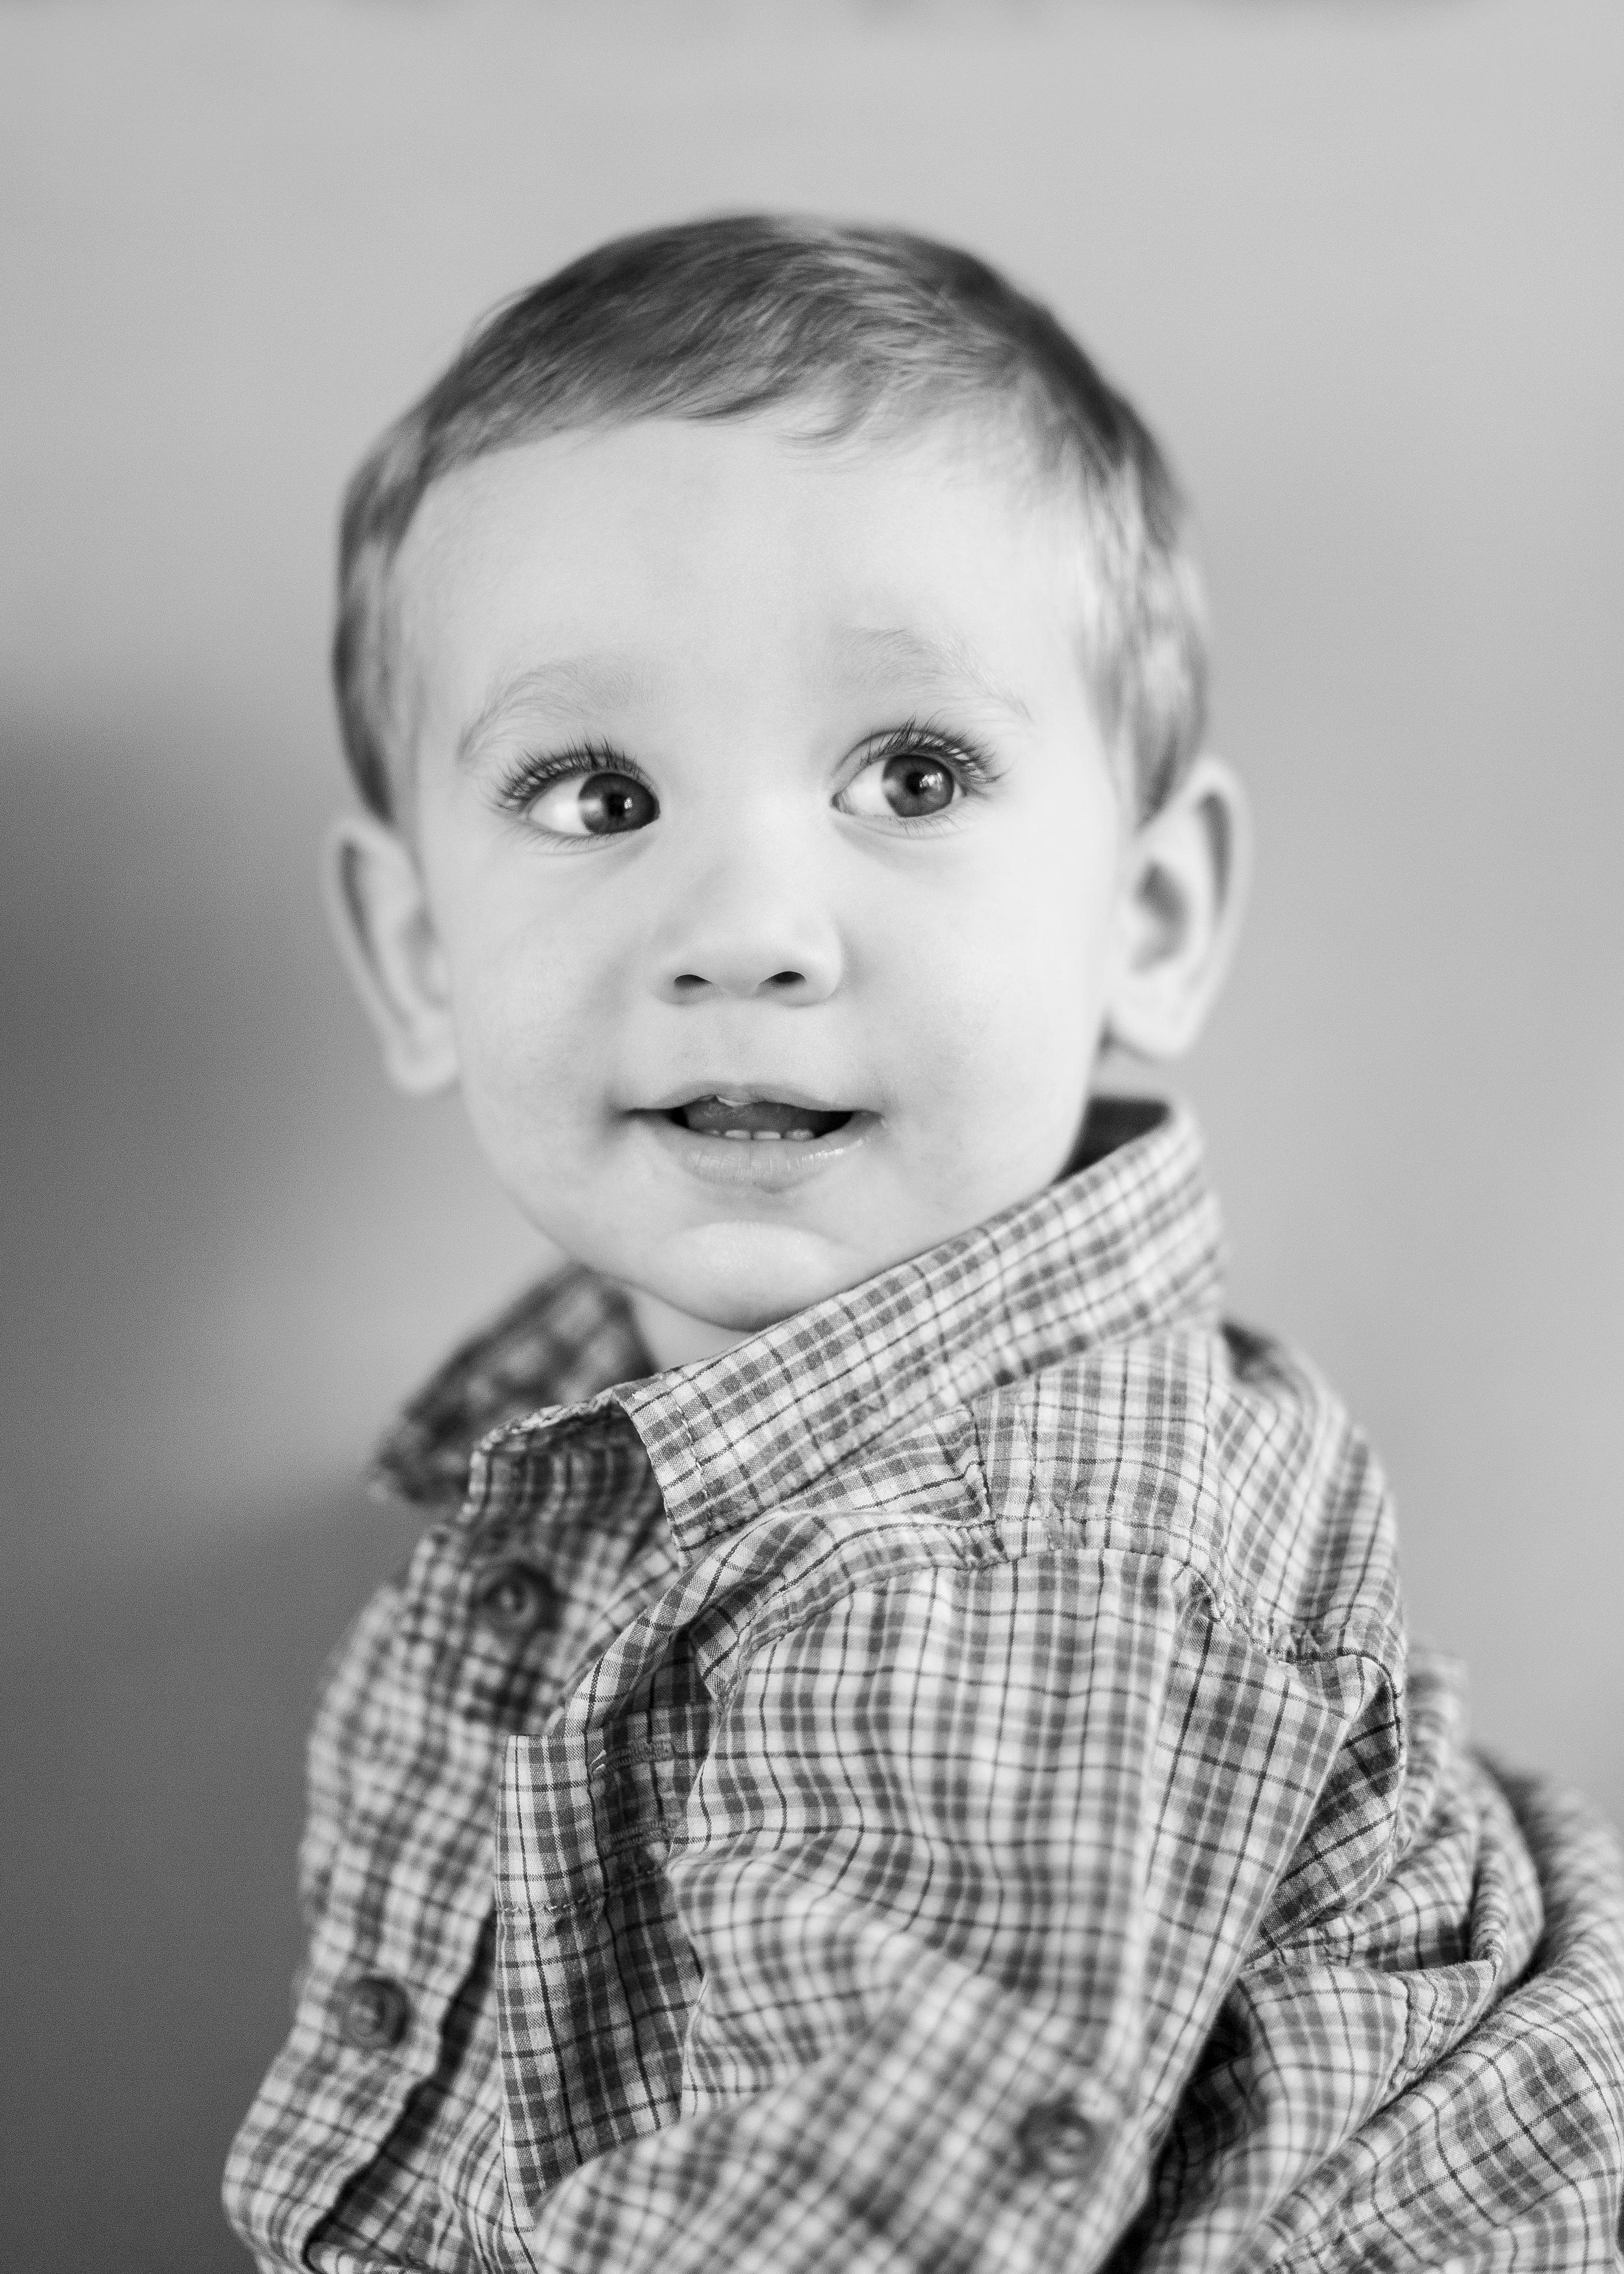 Portrait-Jonah-BW-HR.jpg